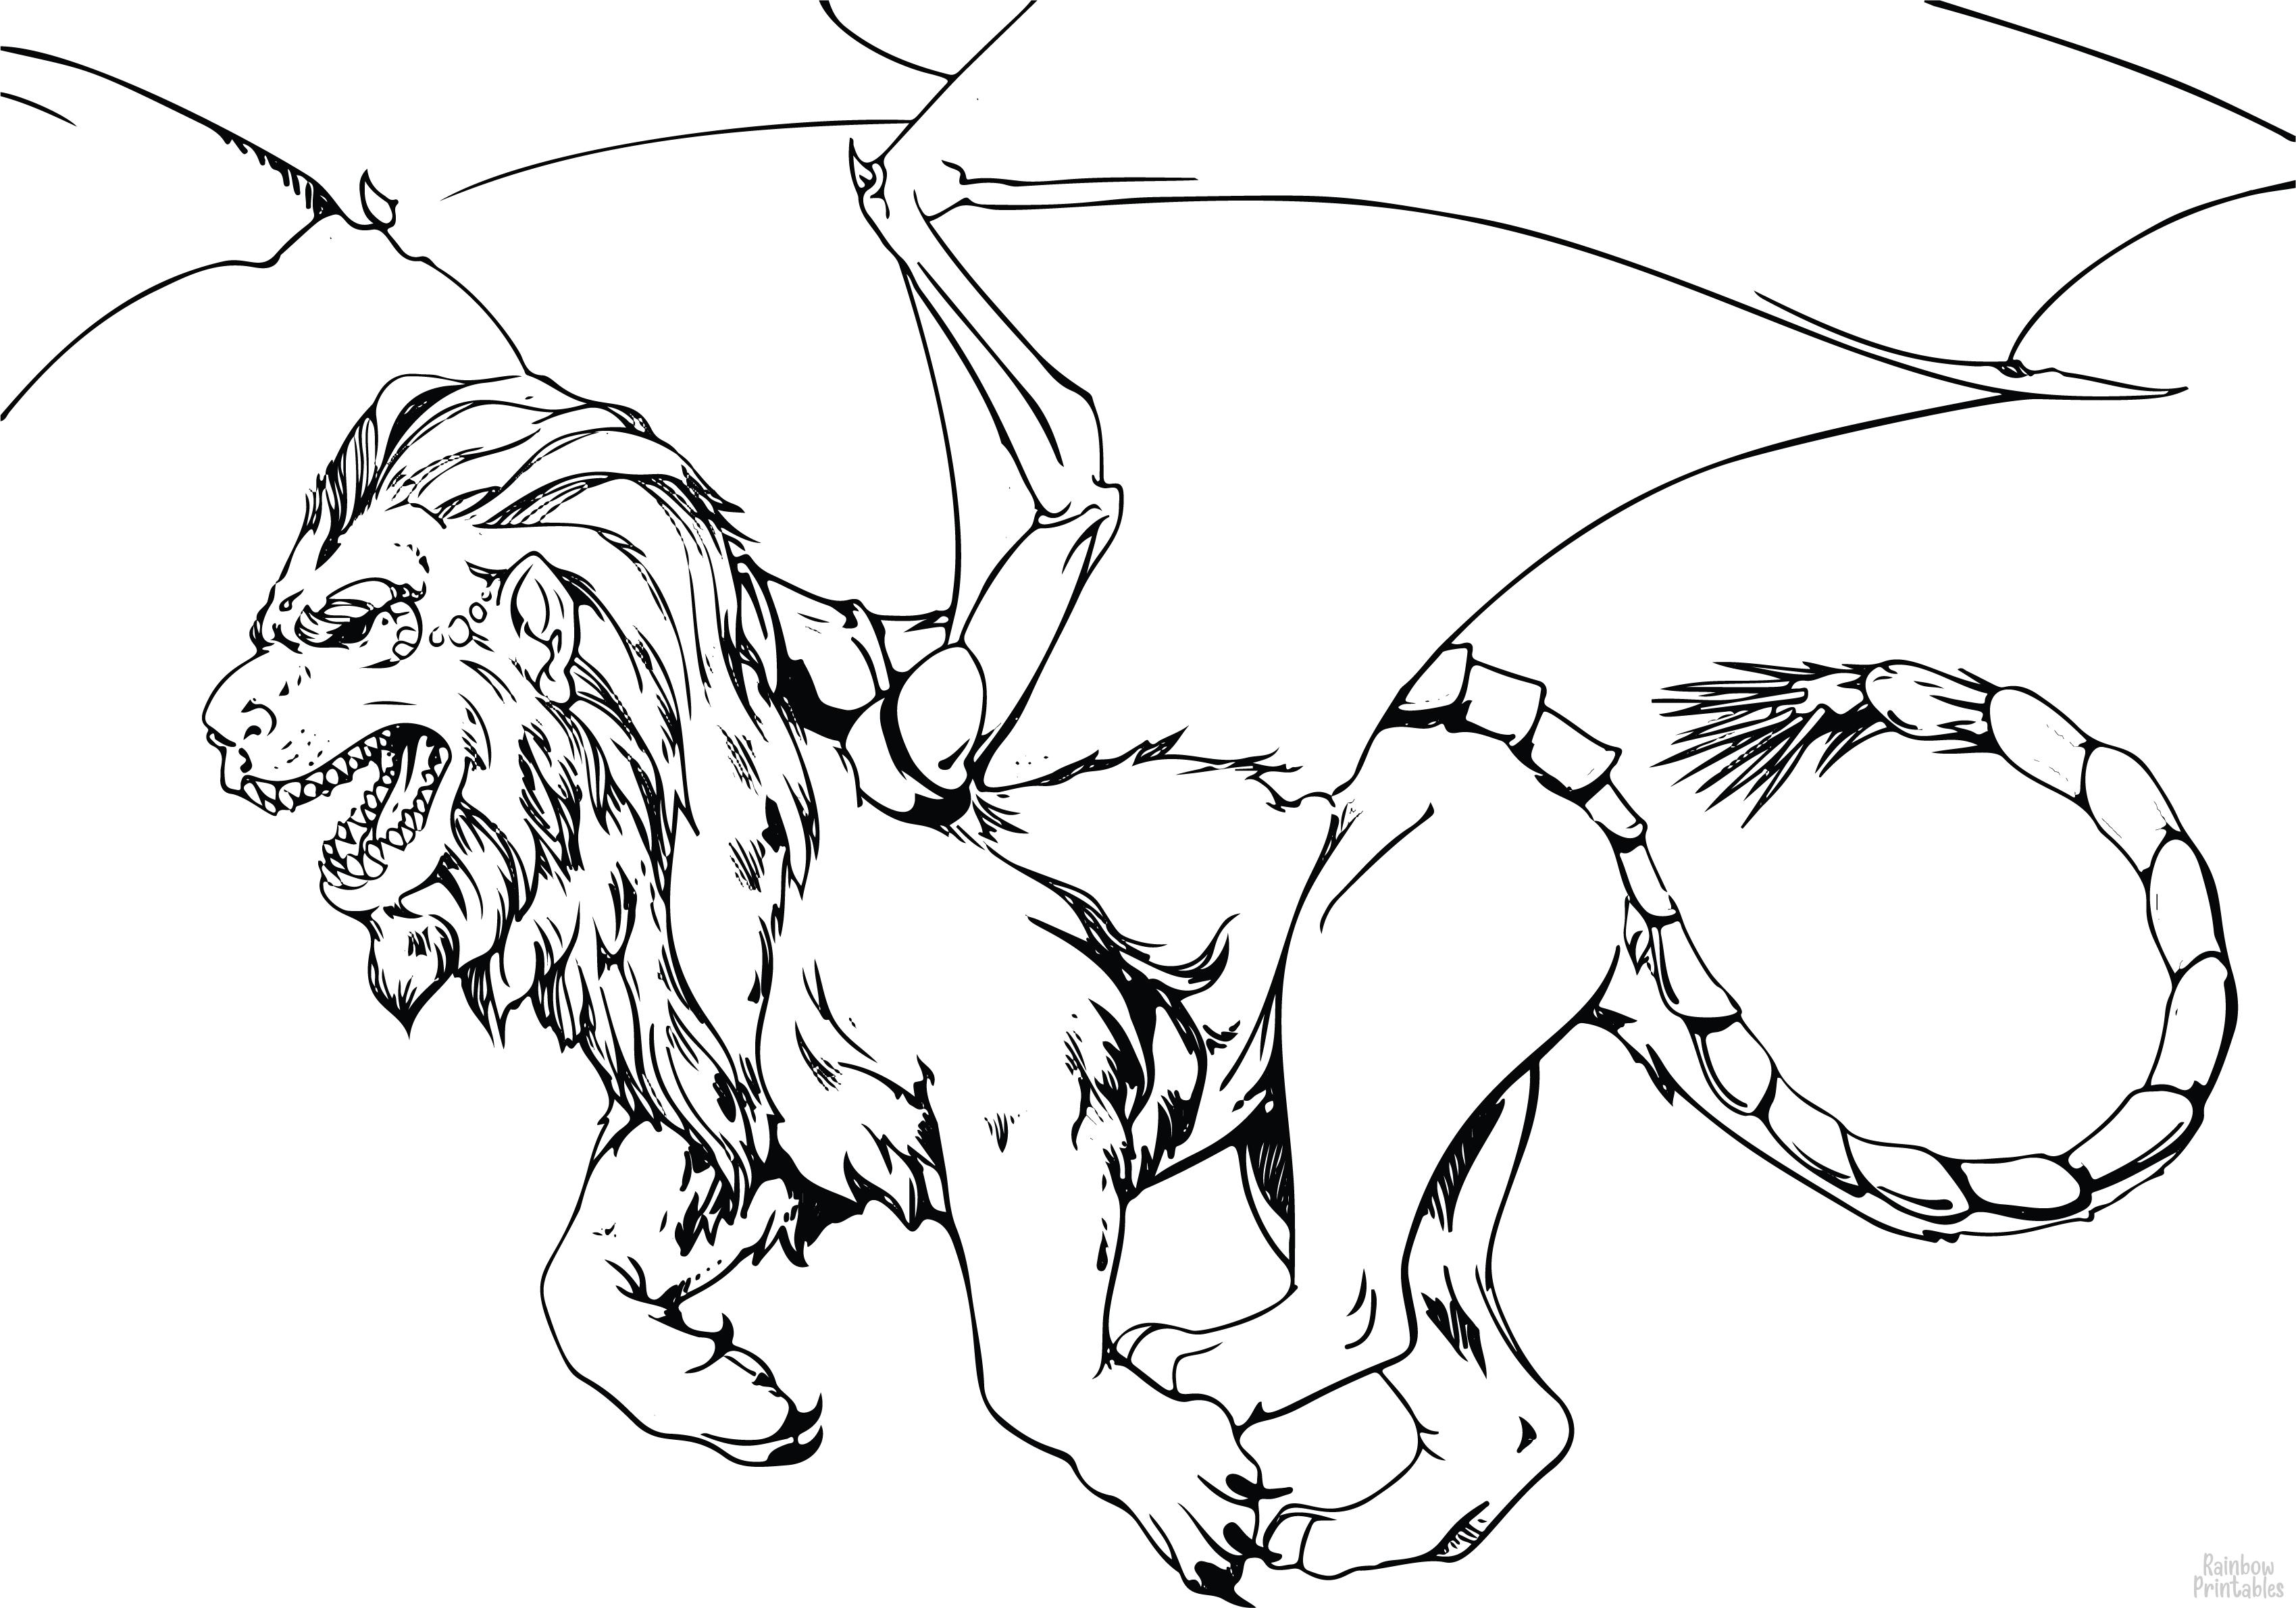 Fantasy Flying Bat Wing Demon Lion Myth Creature e1613173733118